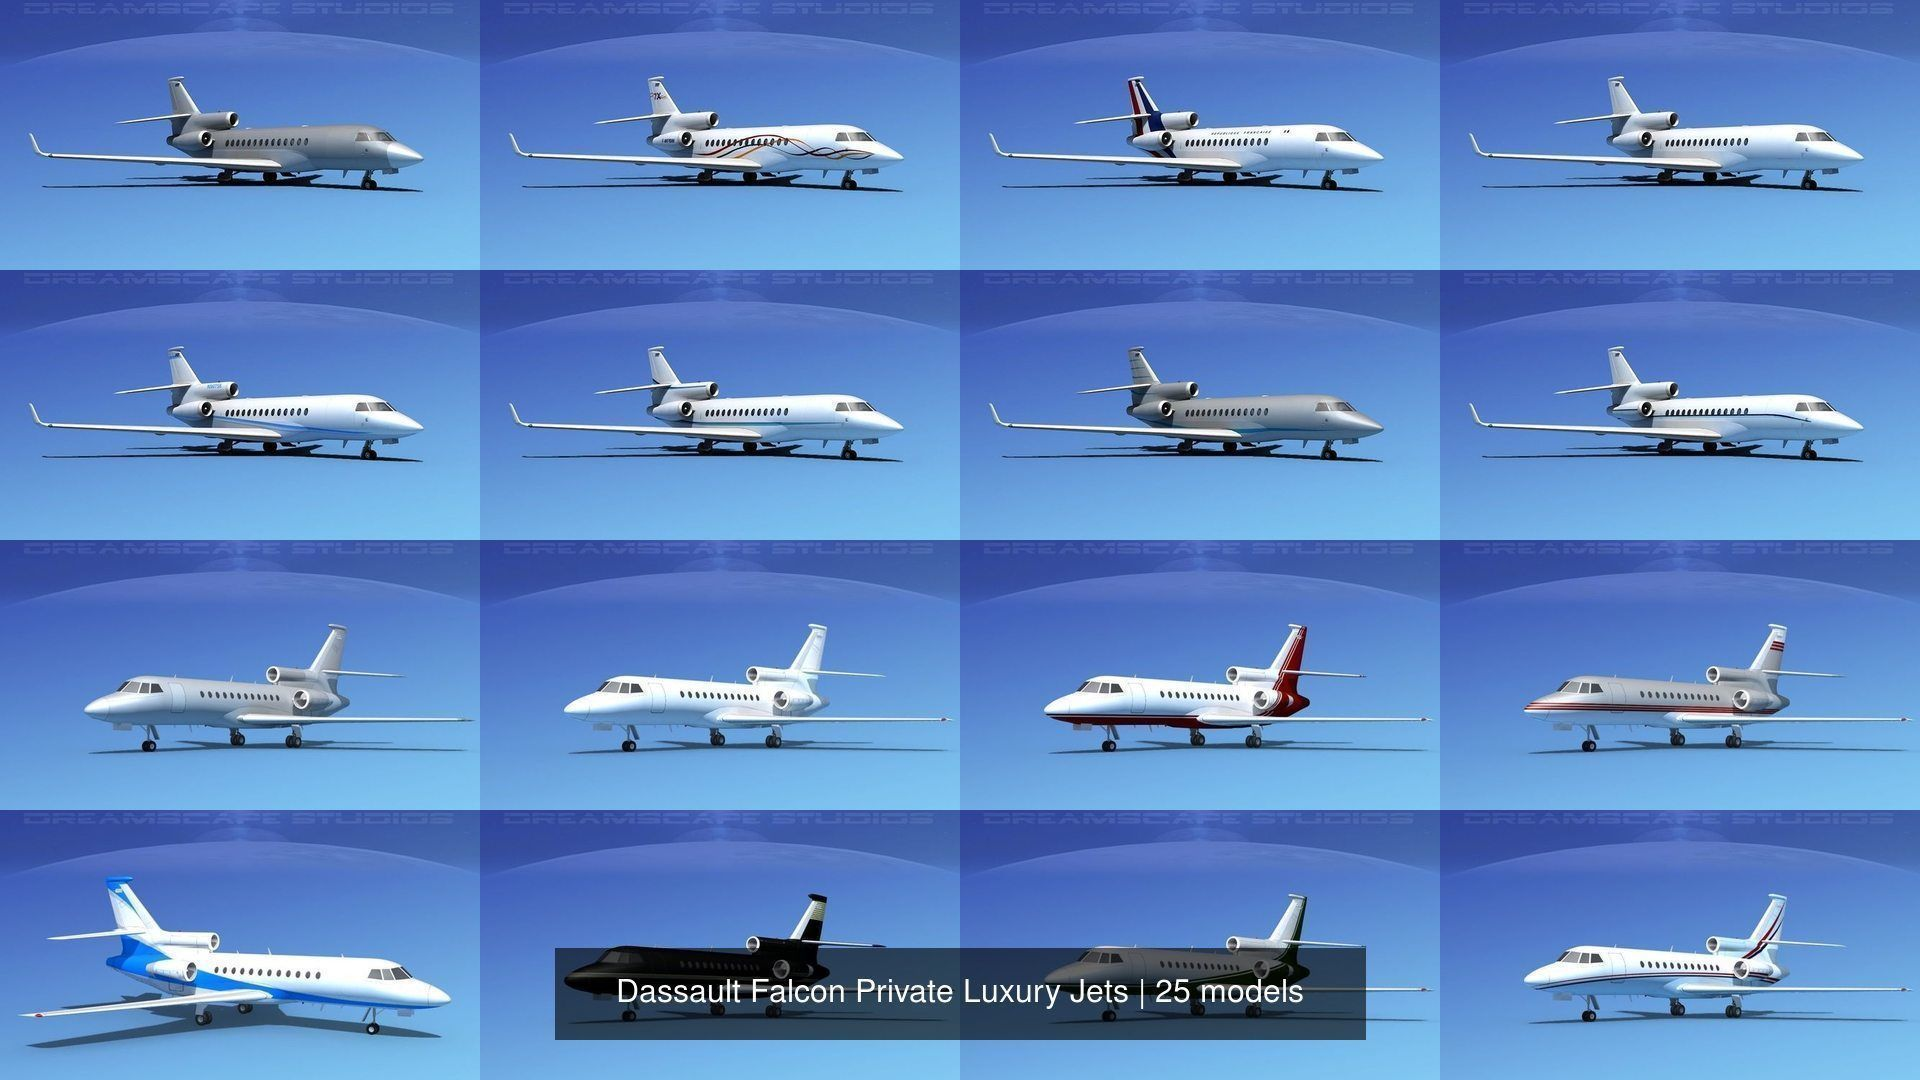 25 Dassault Falcon Private Luxury Jets